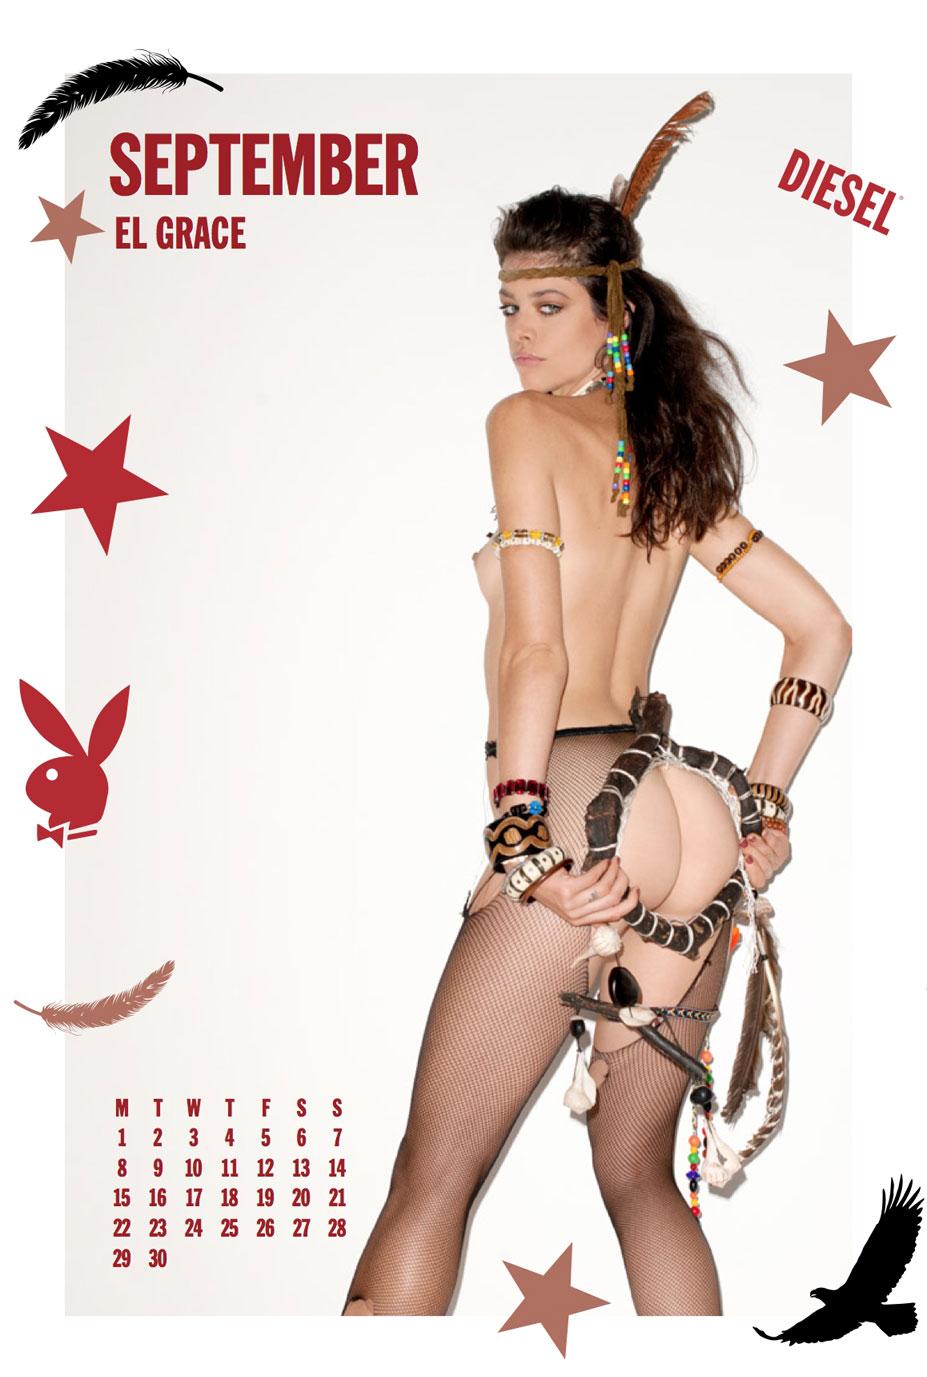 Playboy Diesel 2014 calendar by Terry Richardson